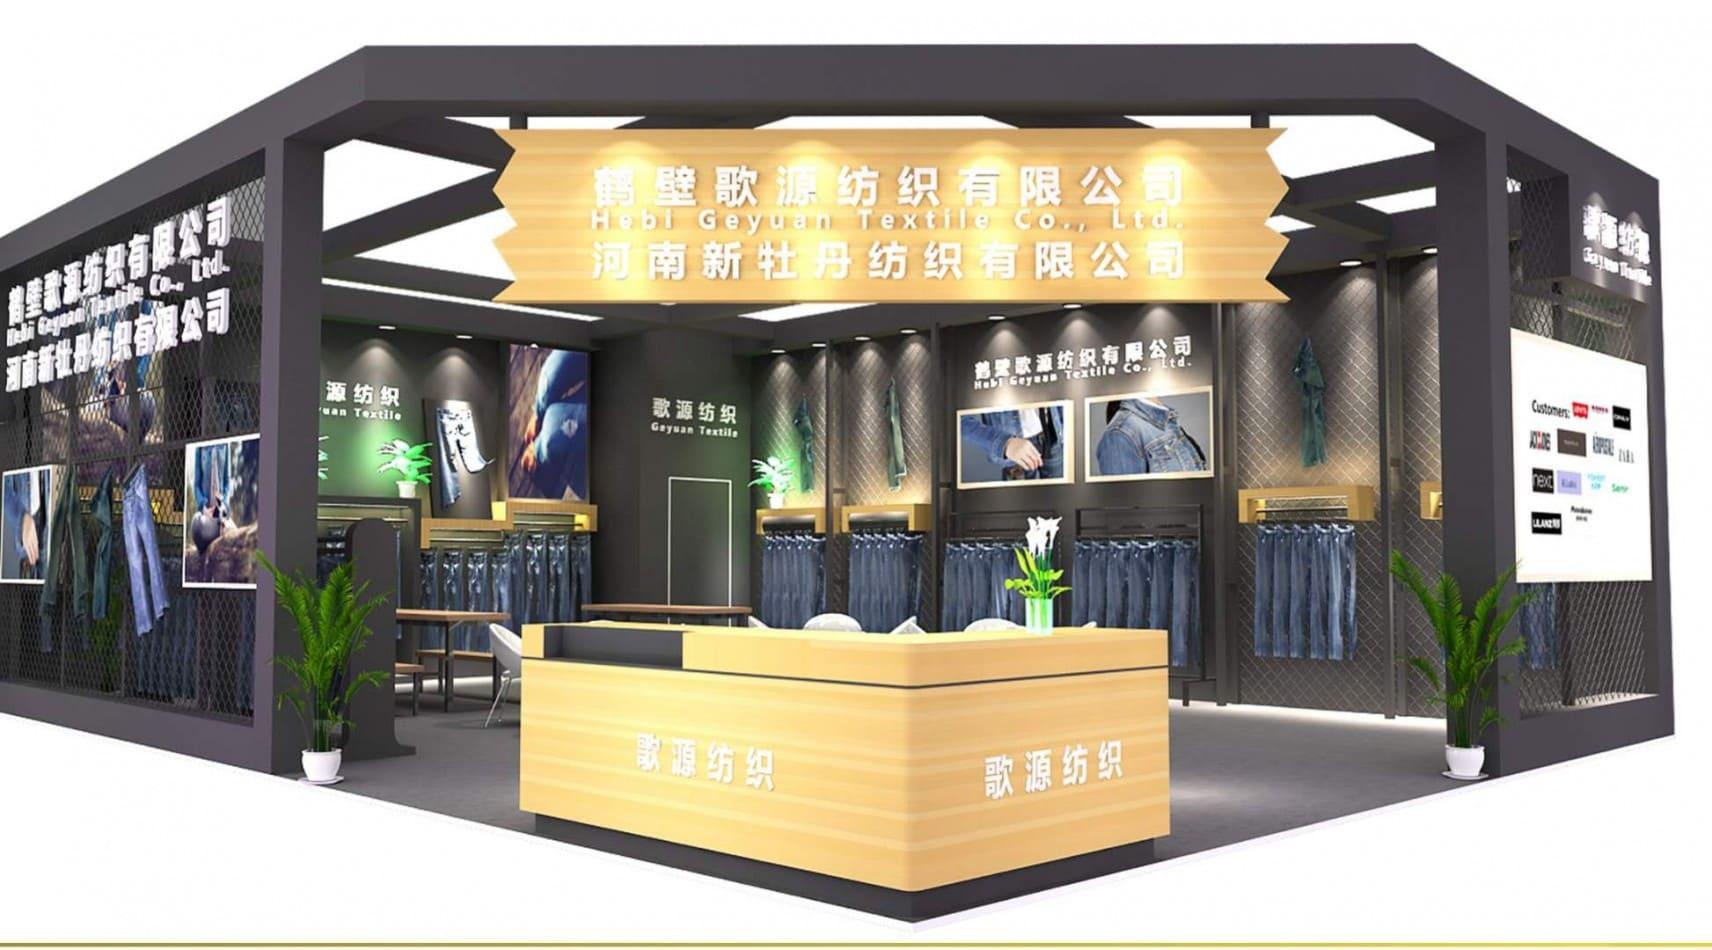 Hebi Geyuan Textile Sales Co., Ltd